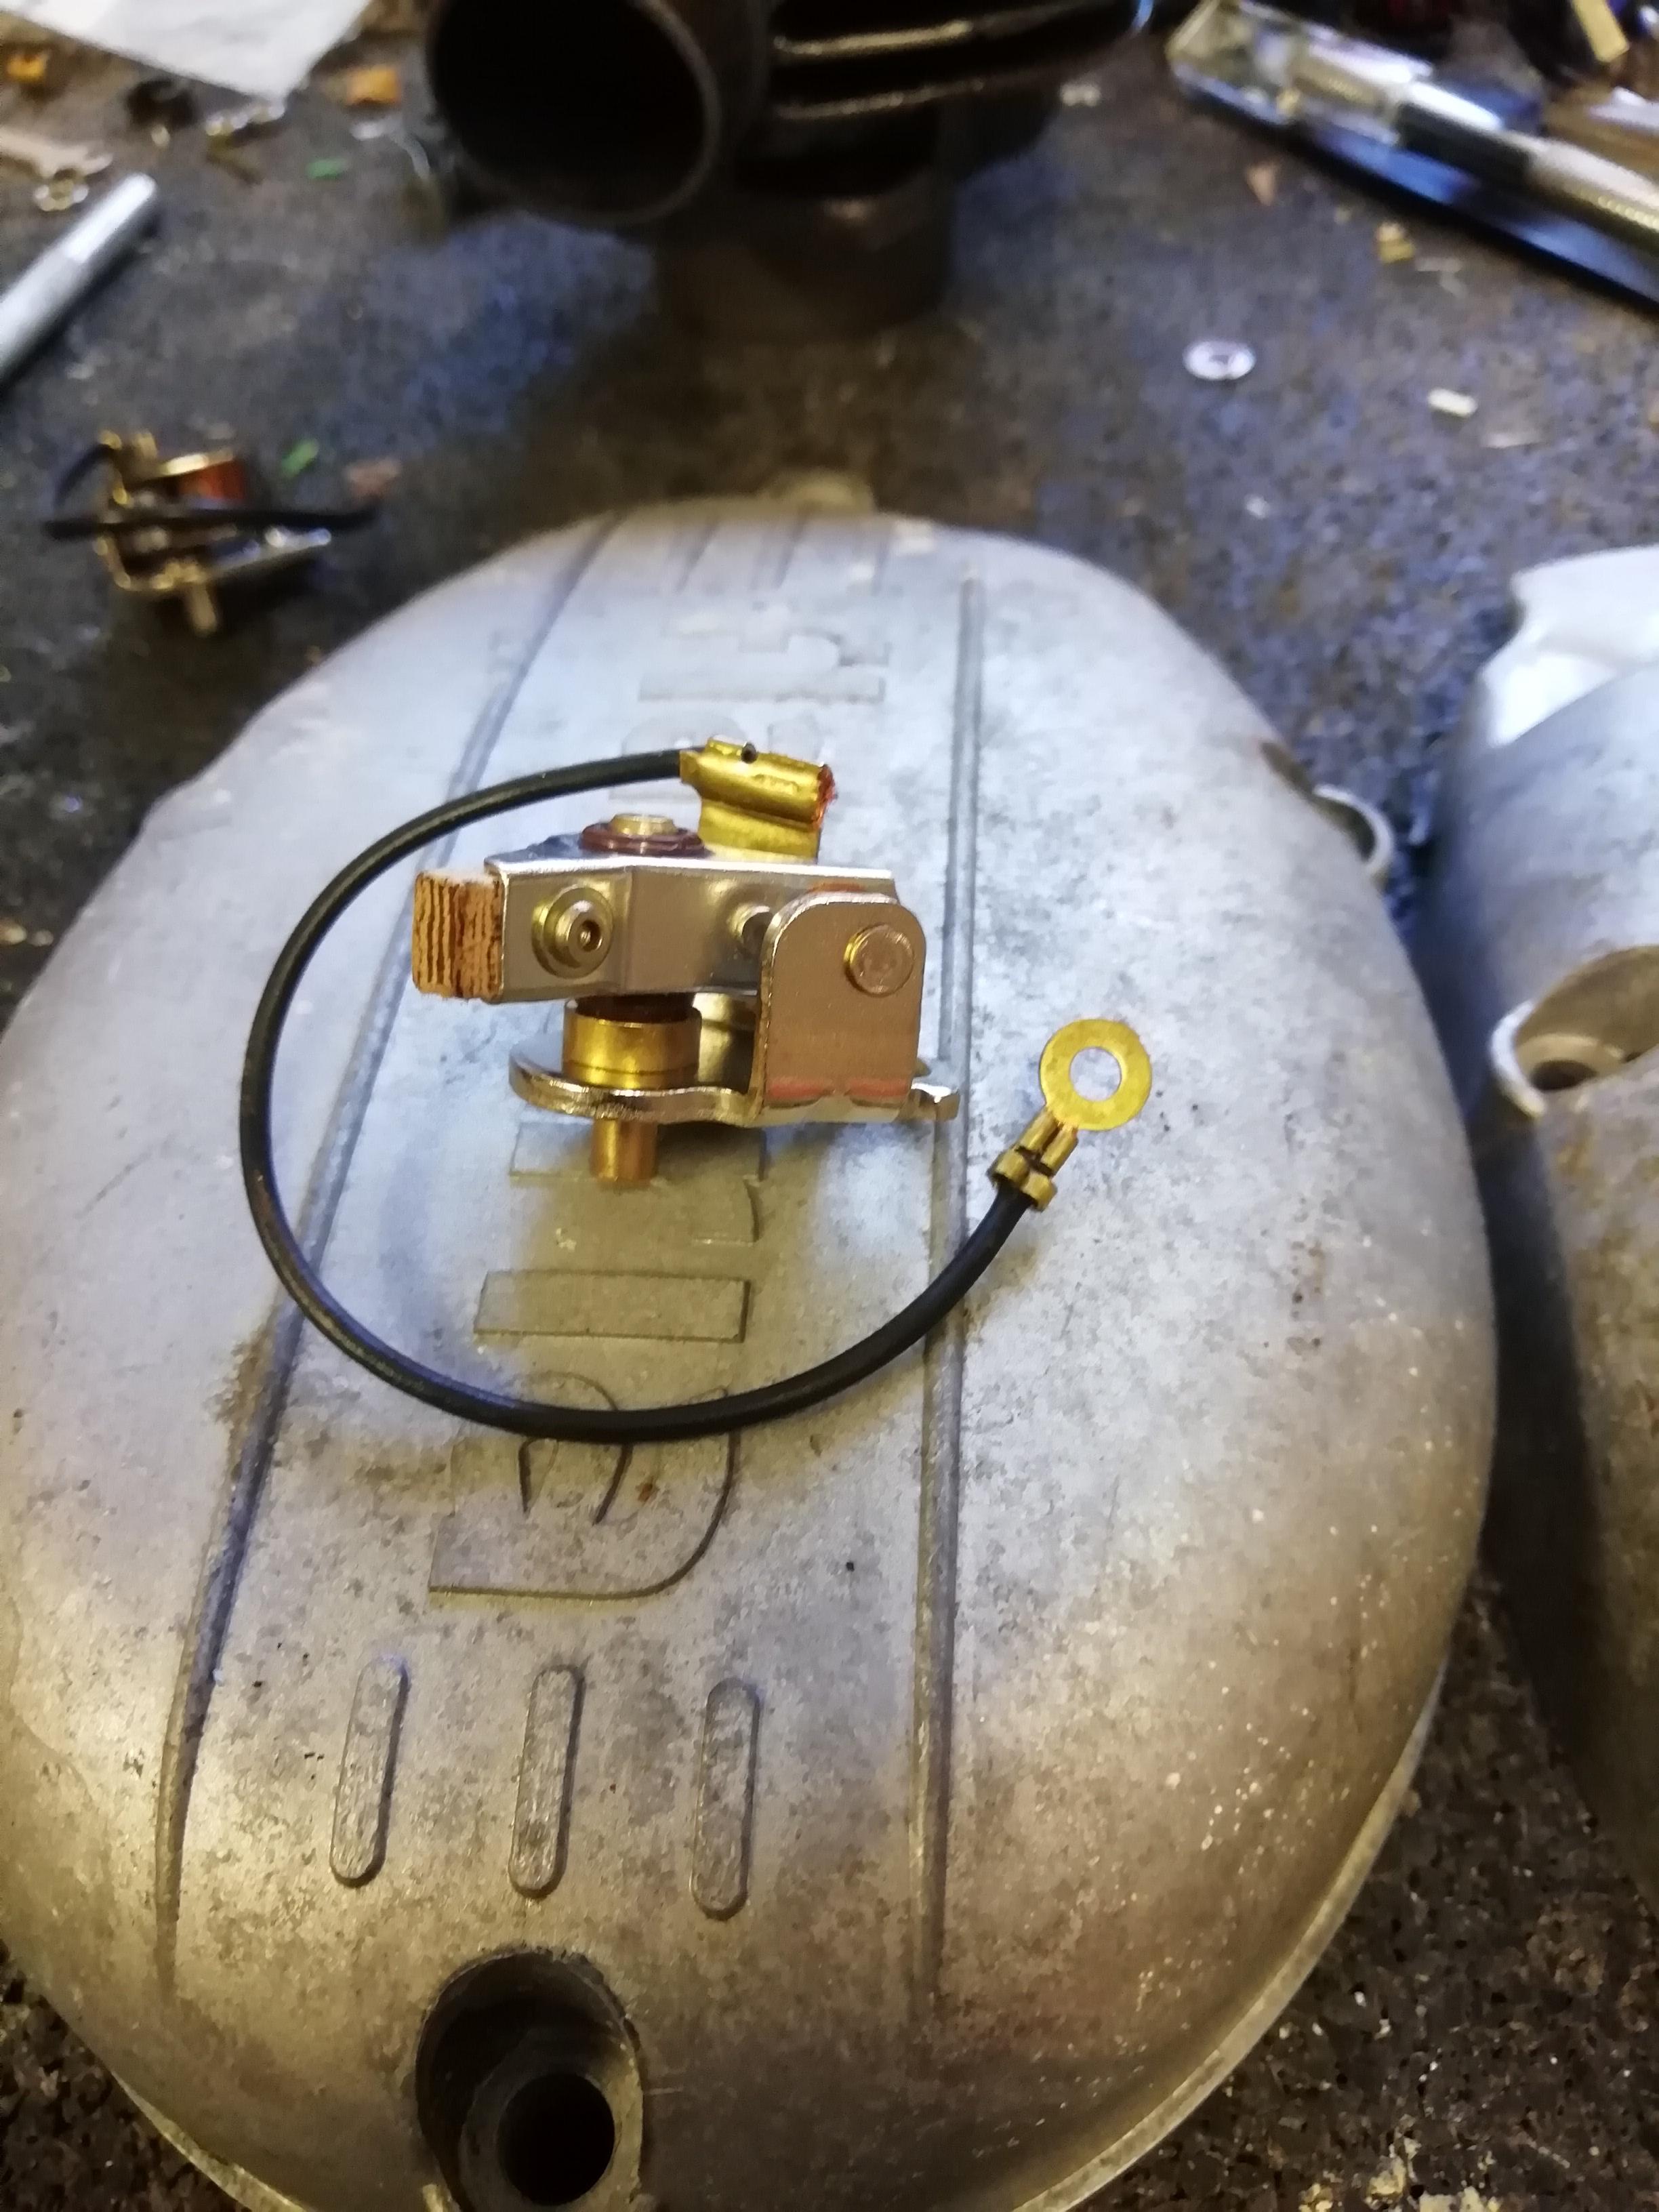 Changement Rupteur-Flandria Penny HZyqKb-IMG-20200910-174457